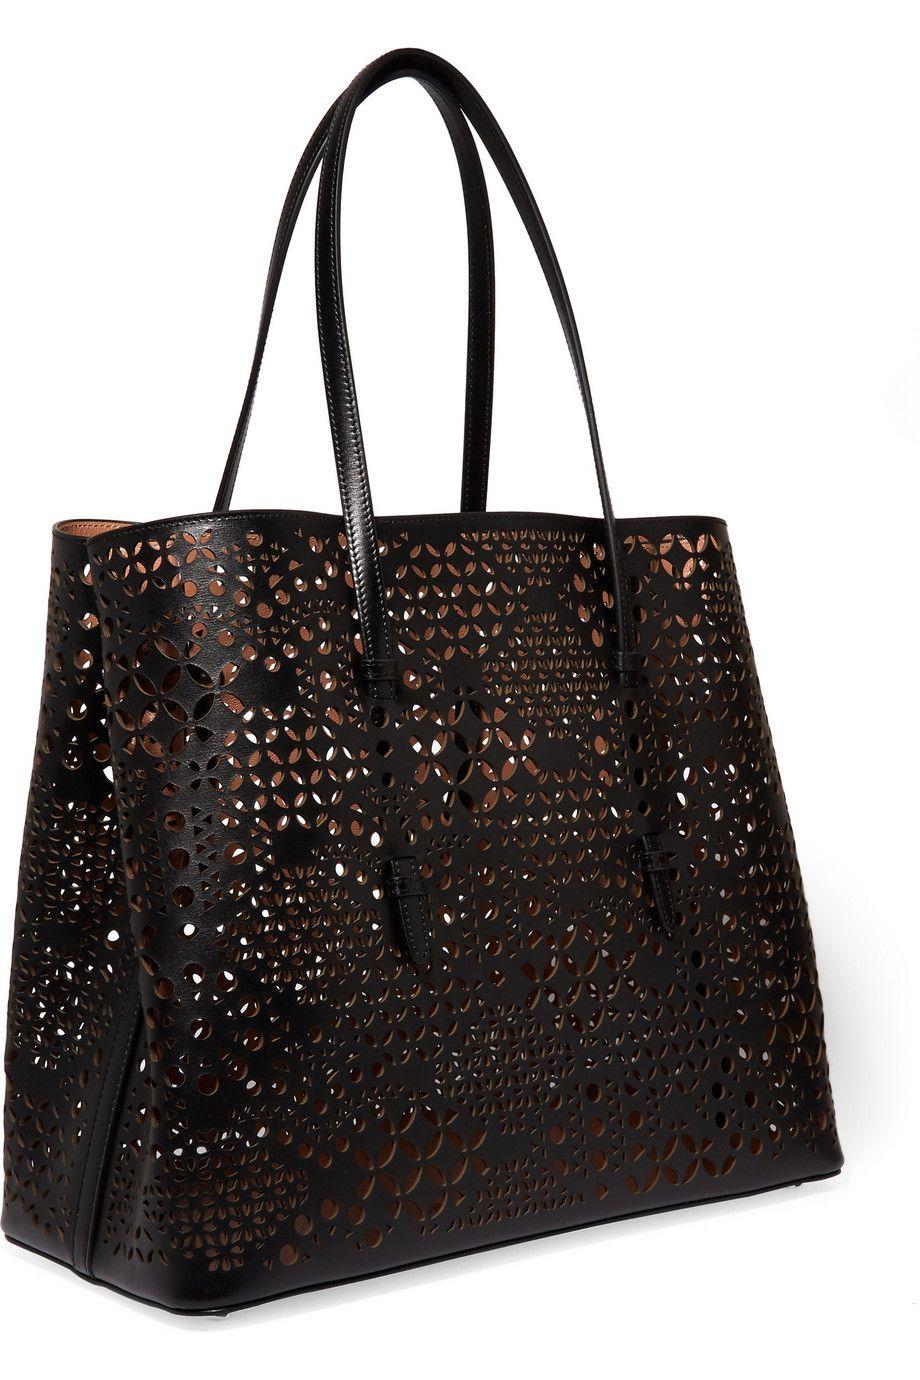 Alaïa   Laser-cut leather tote   NET-A-PORTER.COM   Leather Totes ... 91147be78c